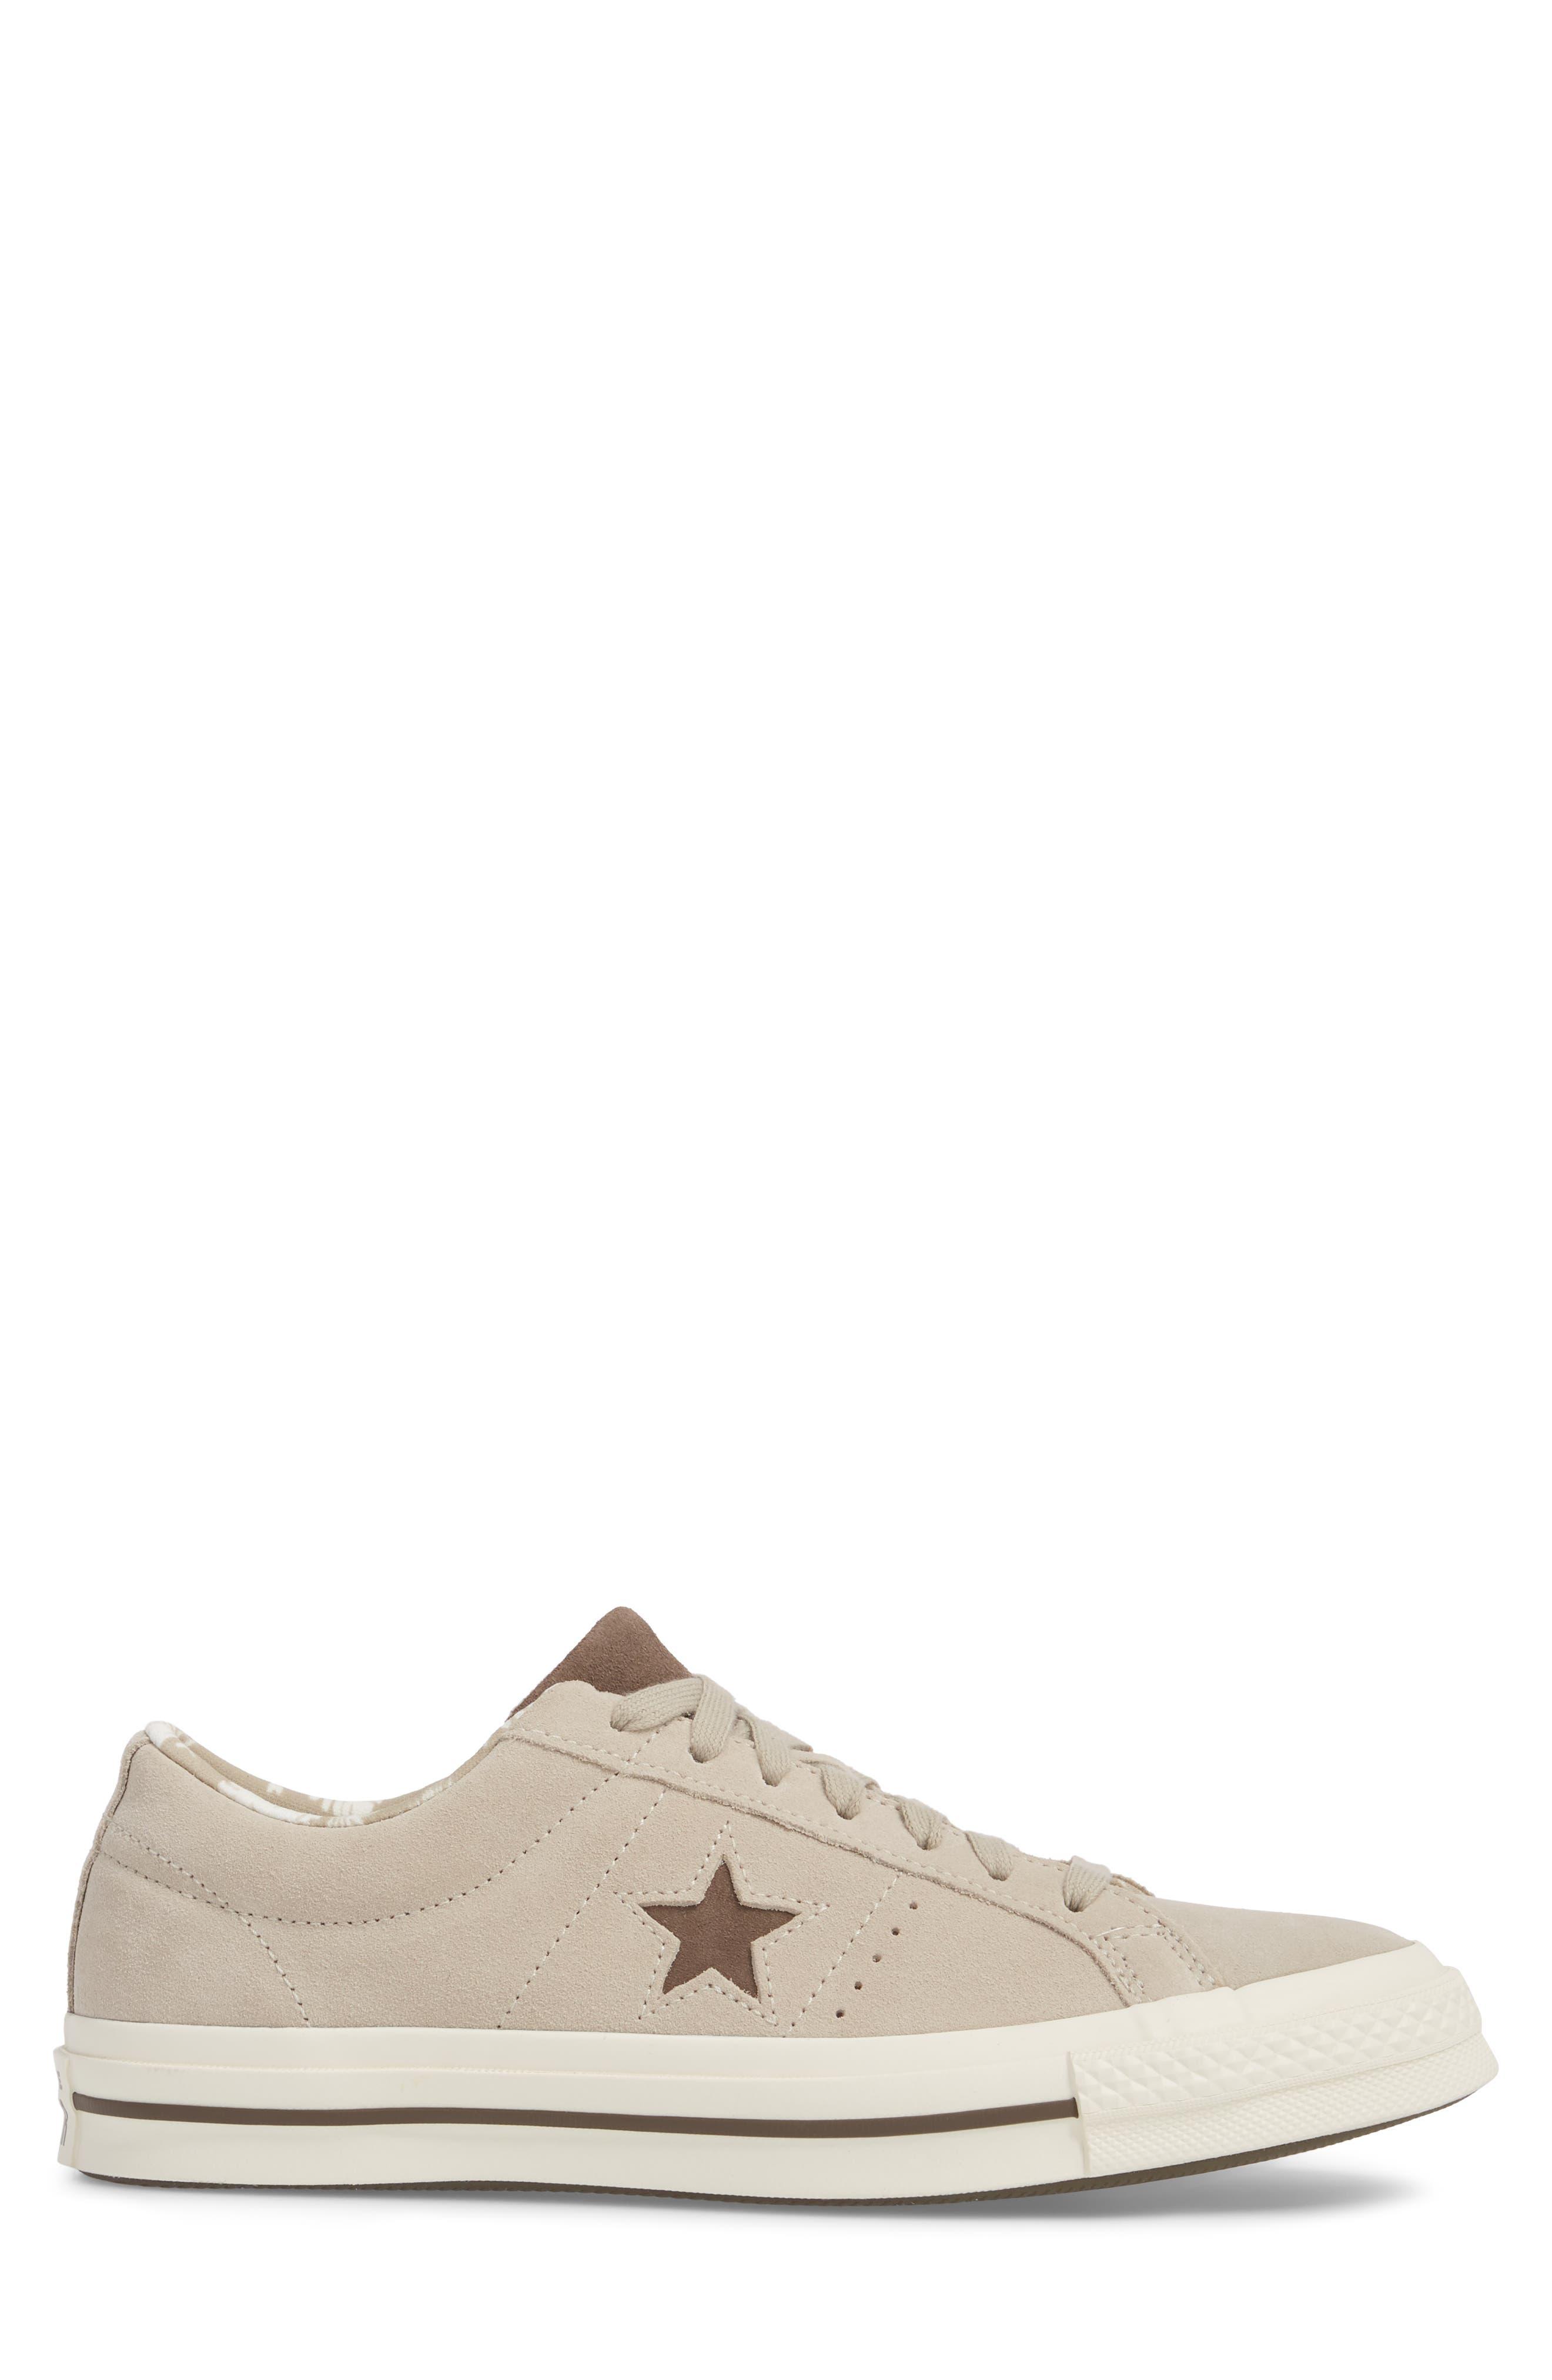 One-Star Tropical Sneaker,                             Alternate thumbnail 3, color,                             Khaki Suede